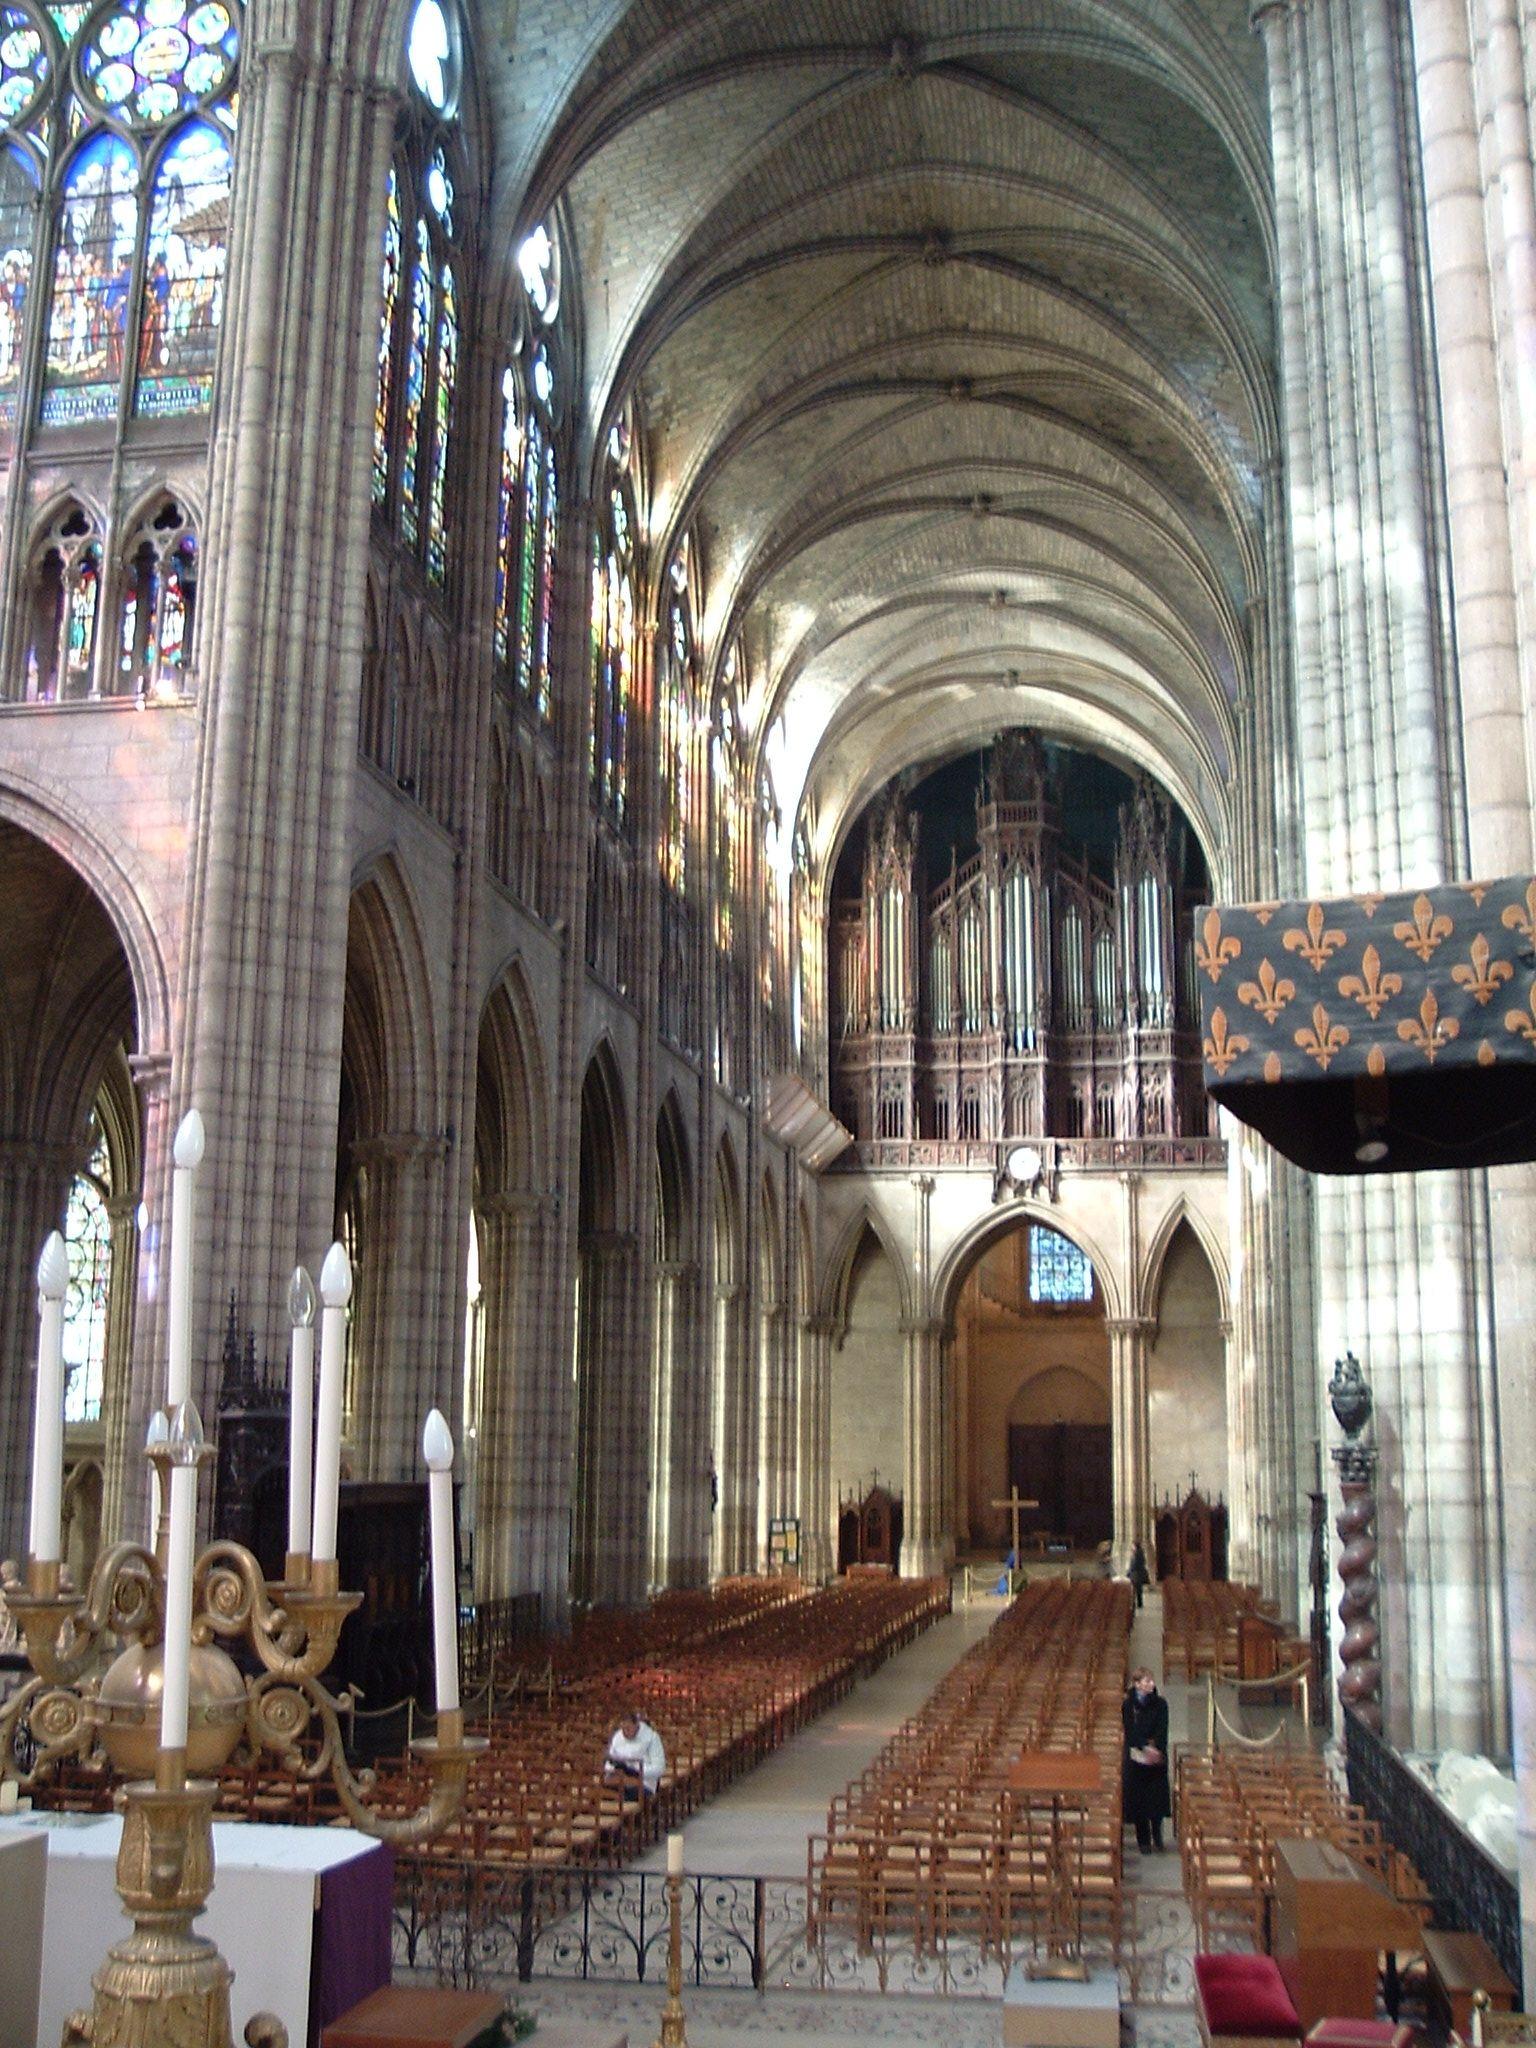 Abbey of Saint-Denis (Paris). Basilica of Saint-Denis. Sights of France 72